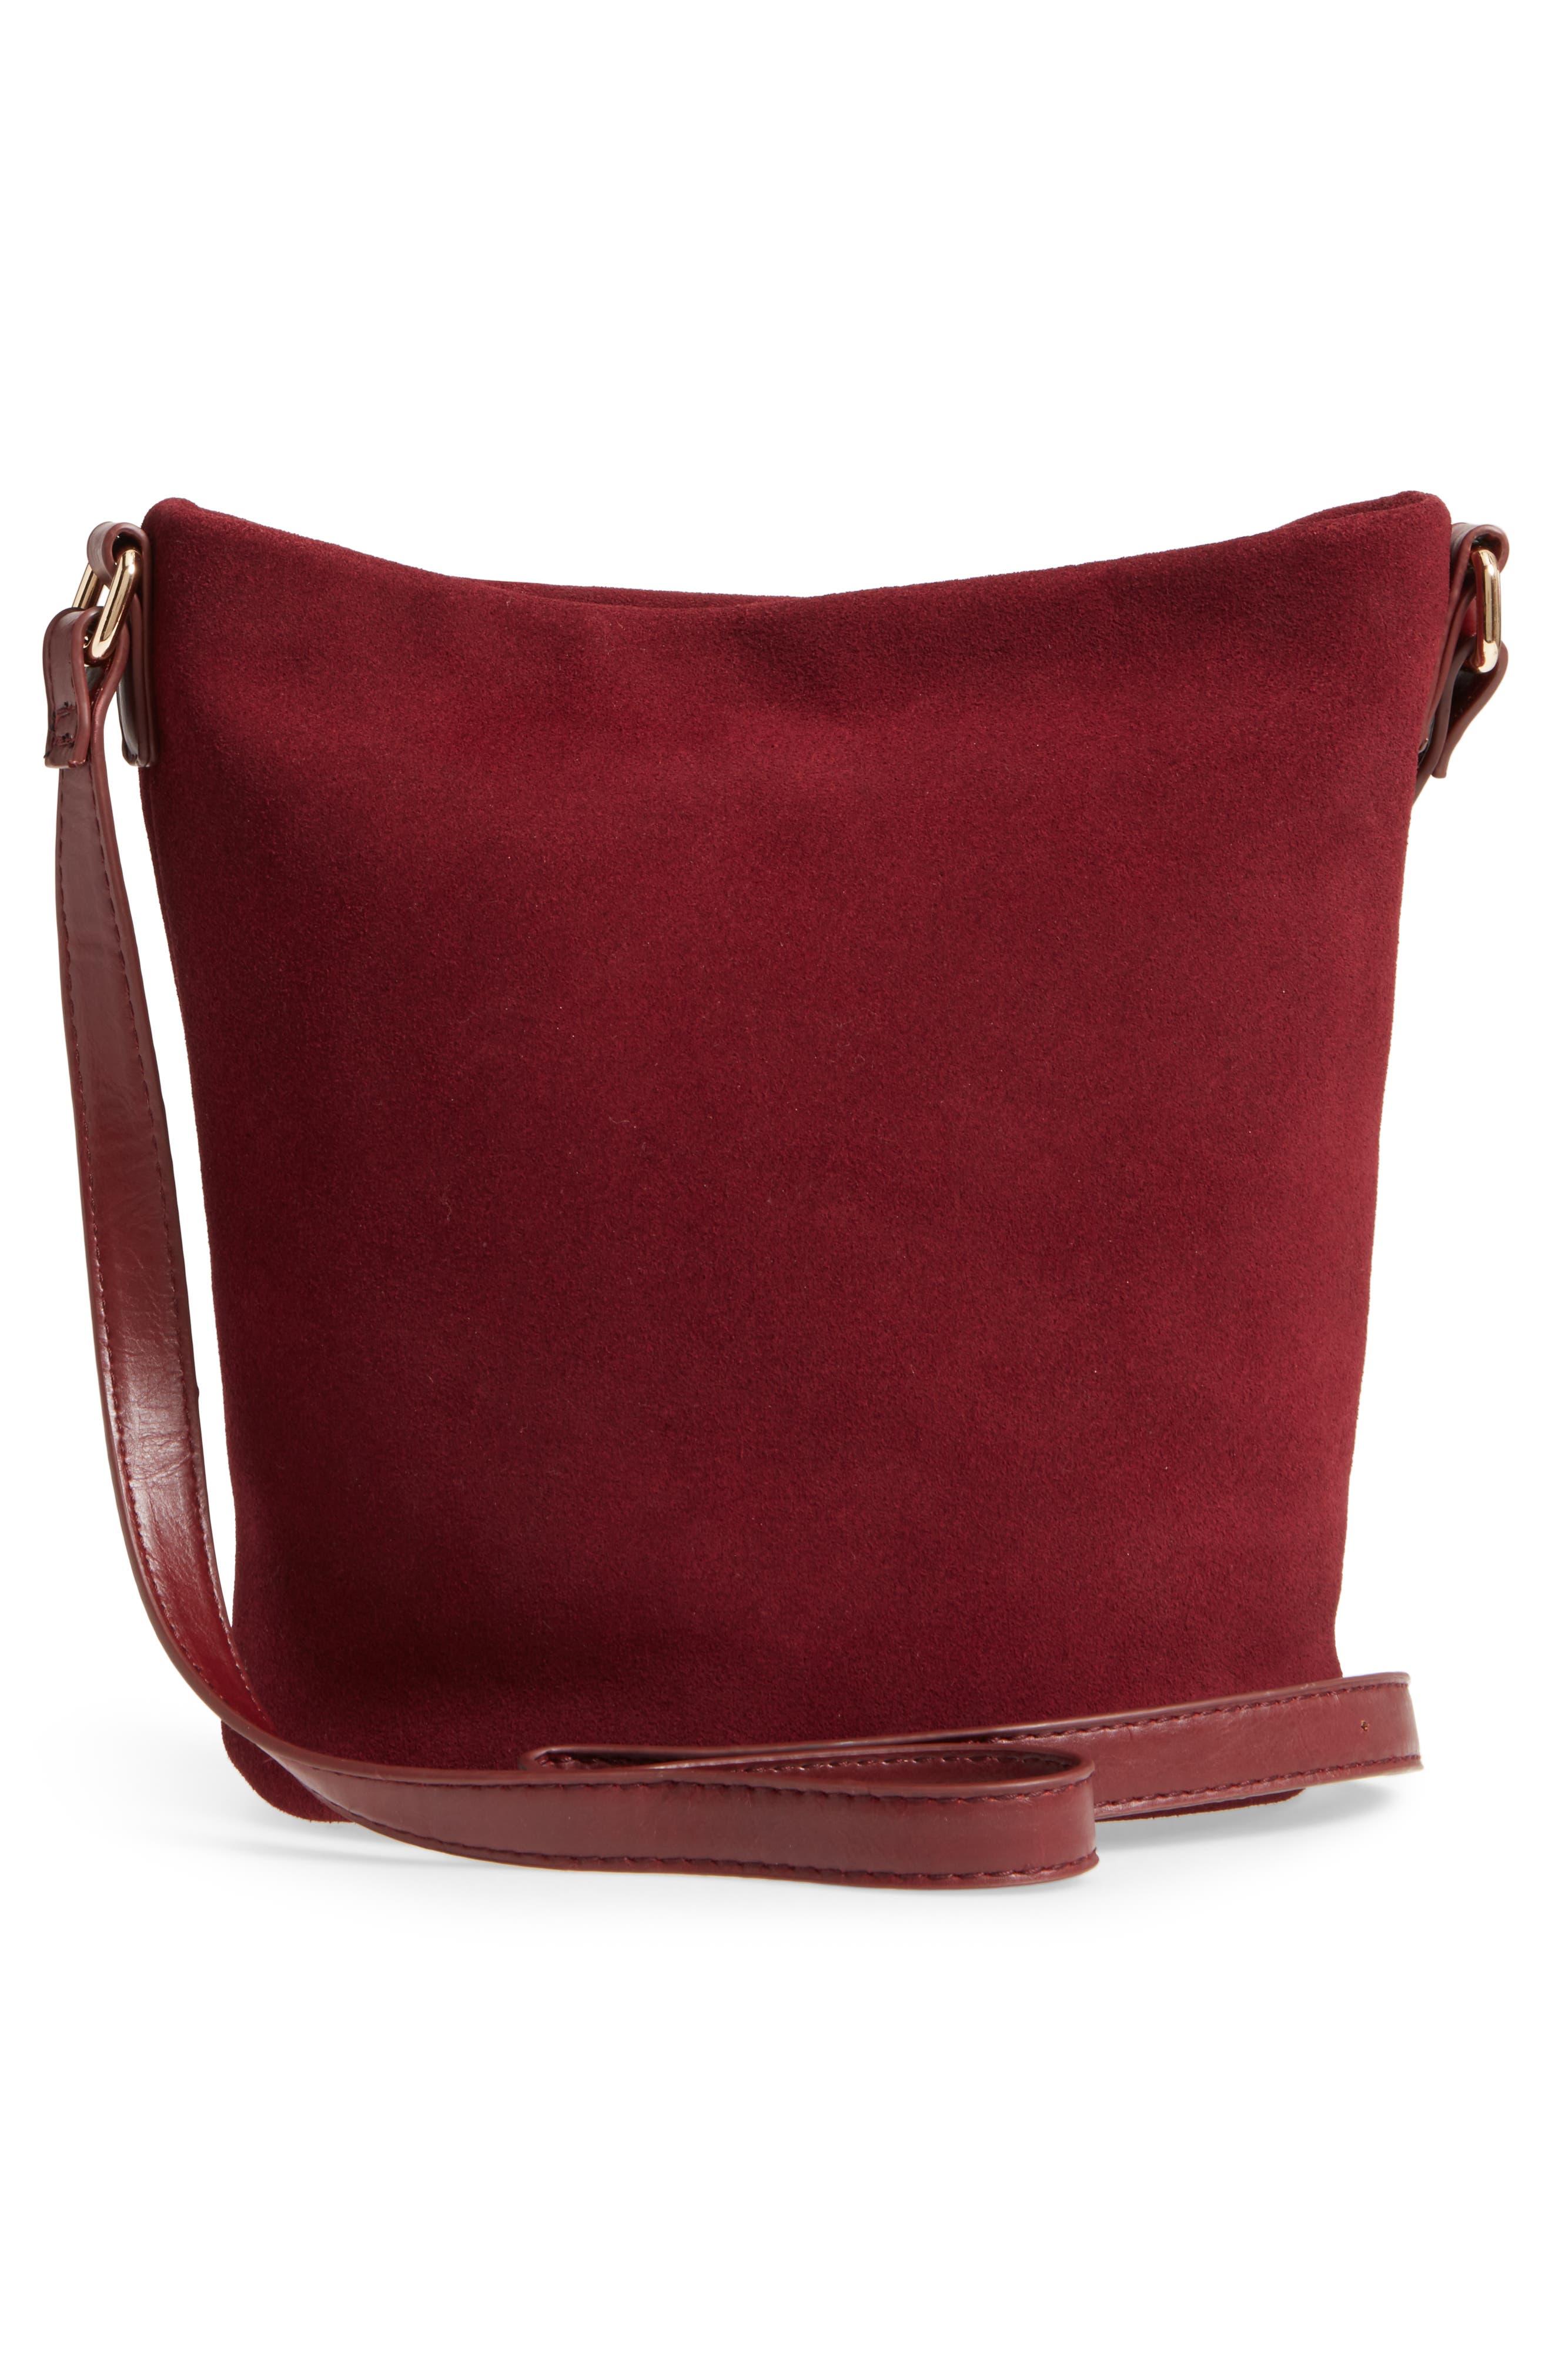 Alternate Image 3  - Sole Society Lana Slouchy Suede Crossbody Bag